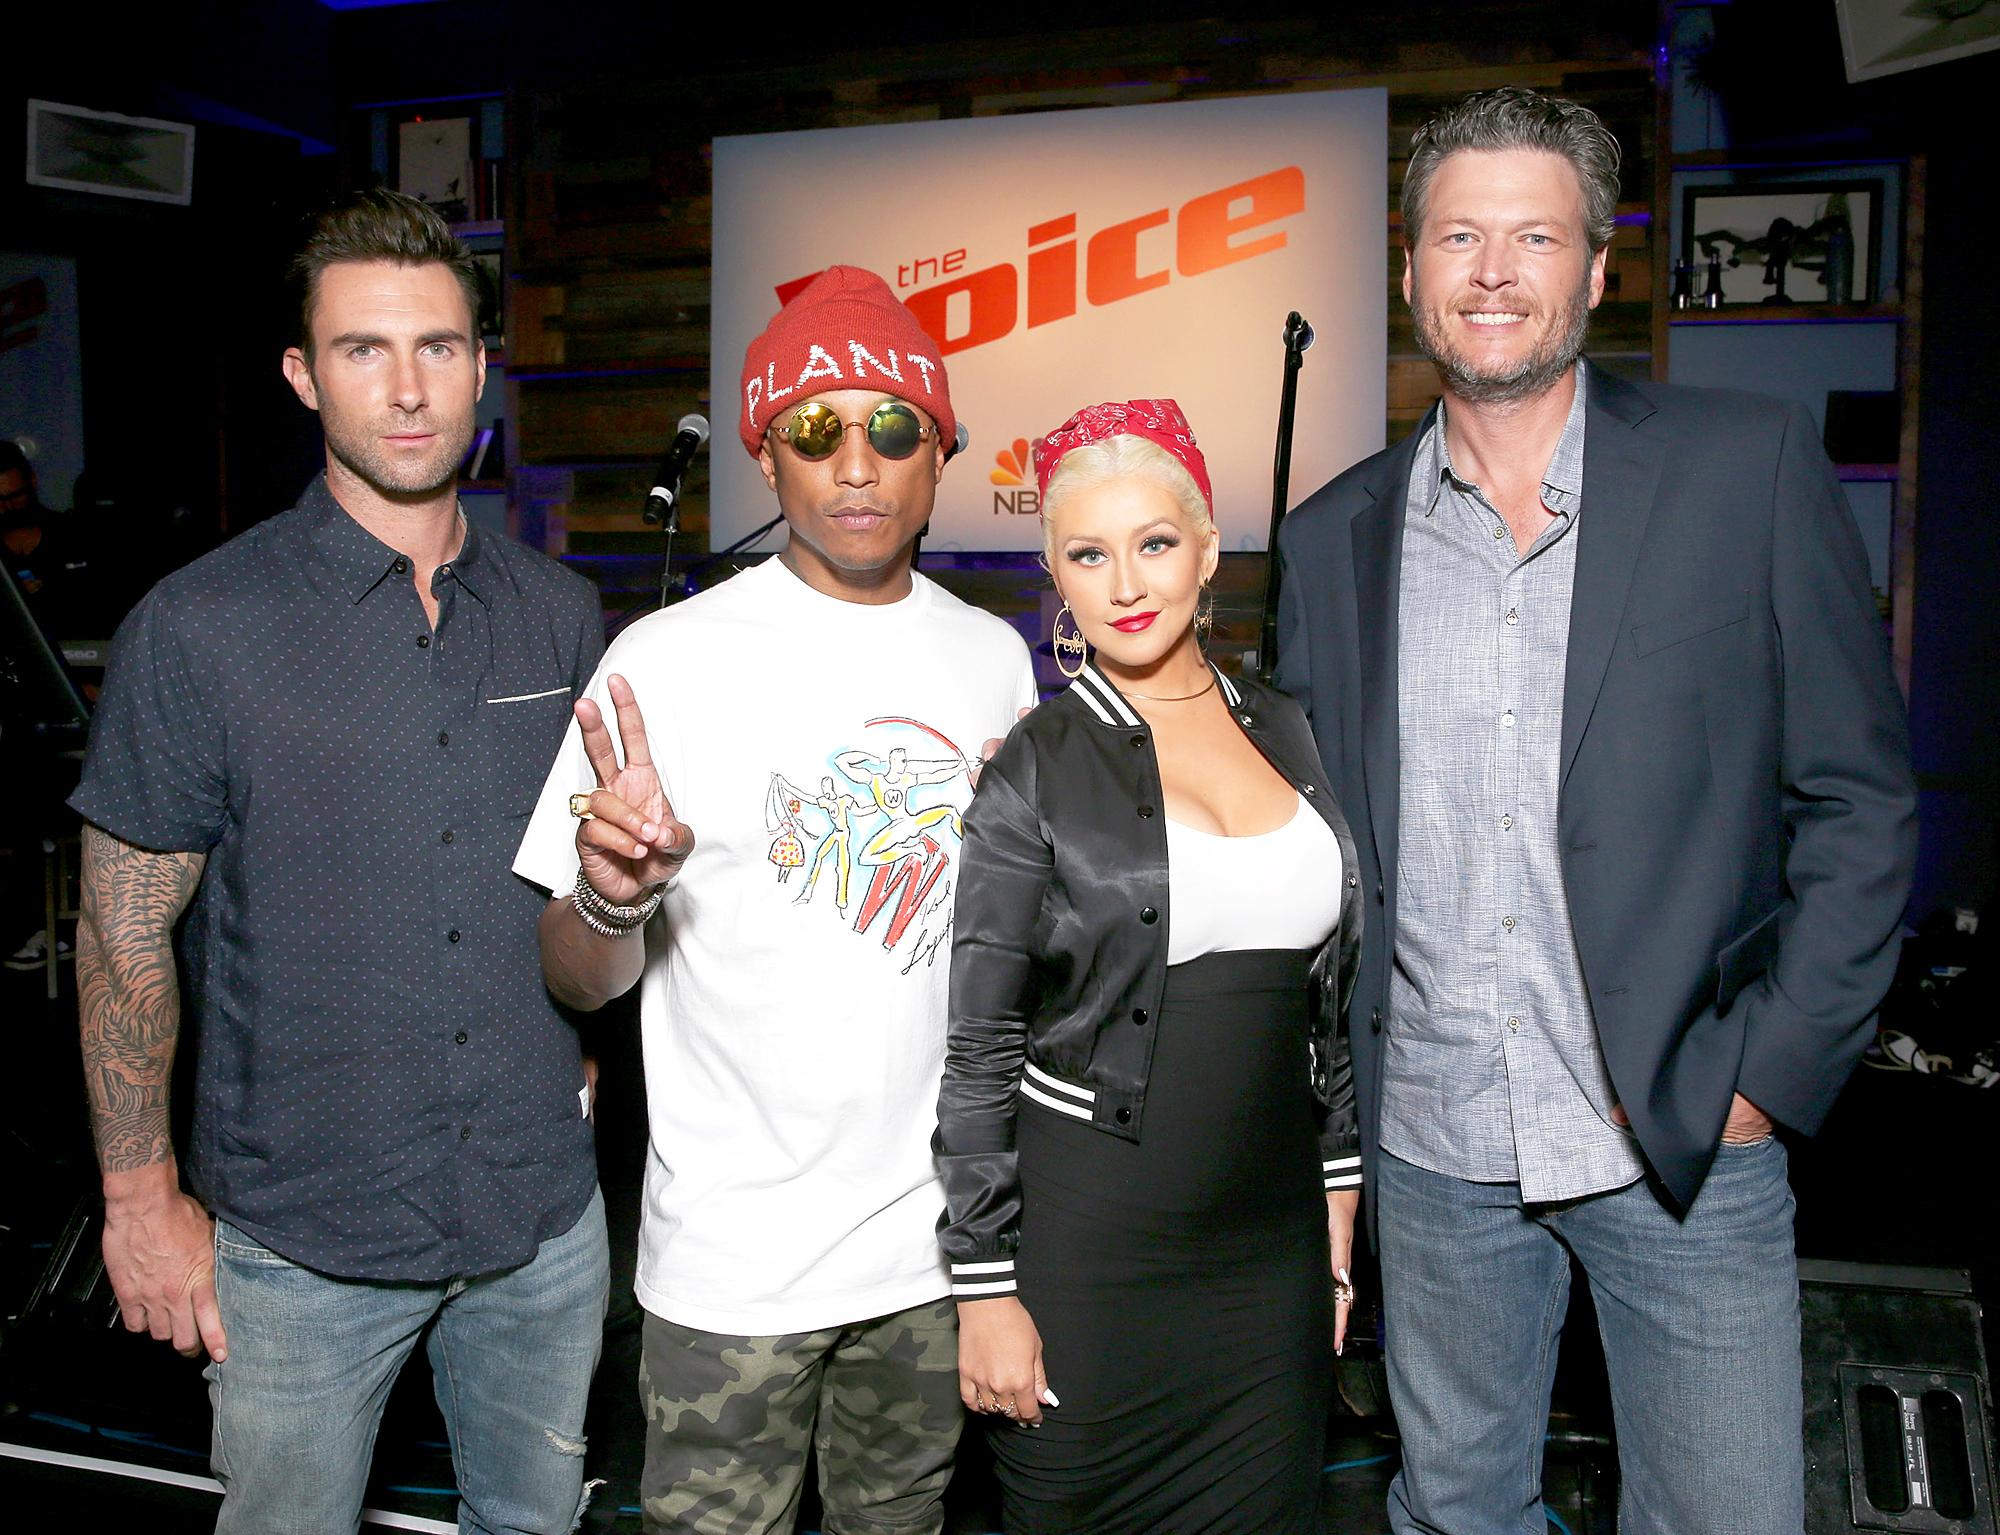 Adam Levine, Pharrell Williams, Christina Aguilera and Blake Shelton